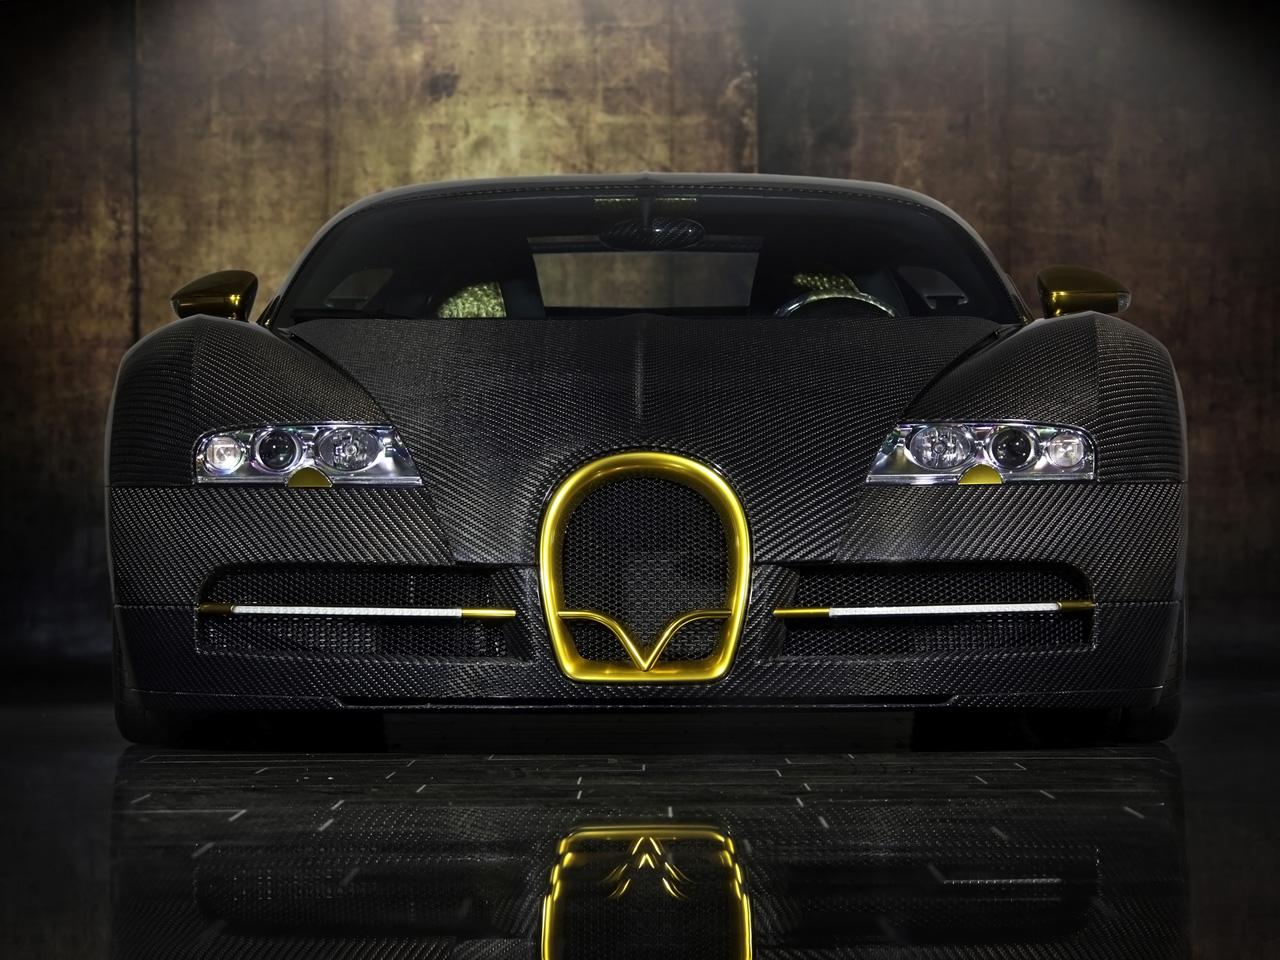 I Love Gold? Mansory LINEA Vincero Du0027oro Bugatti Veyron